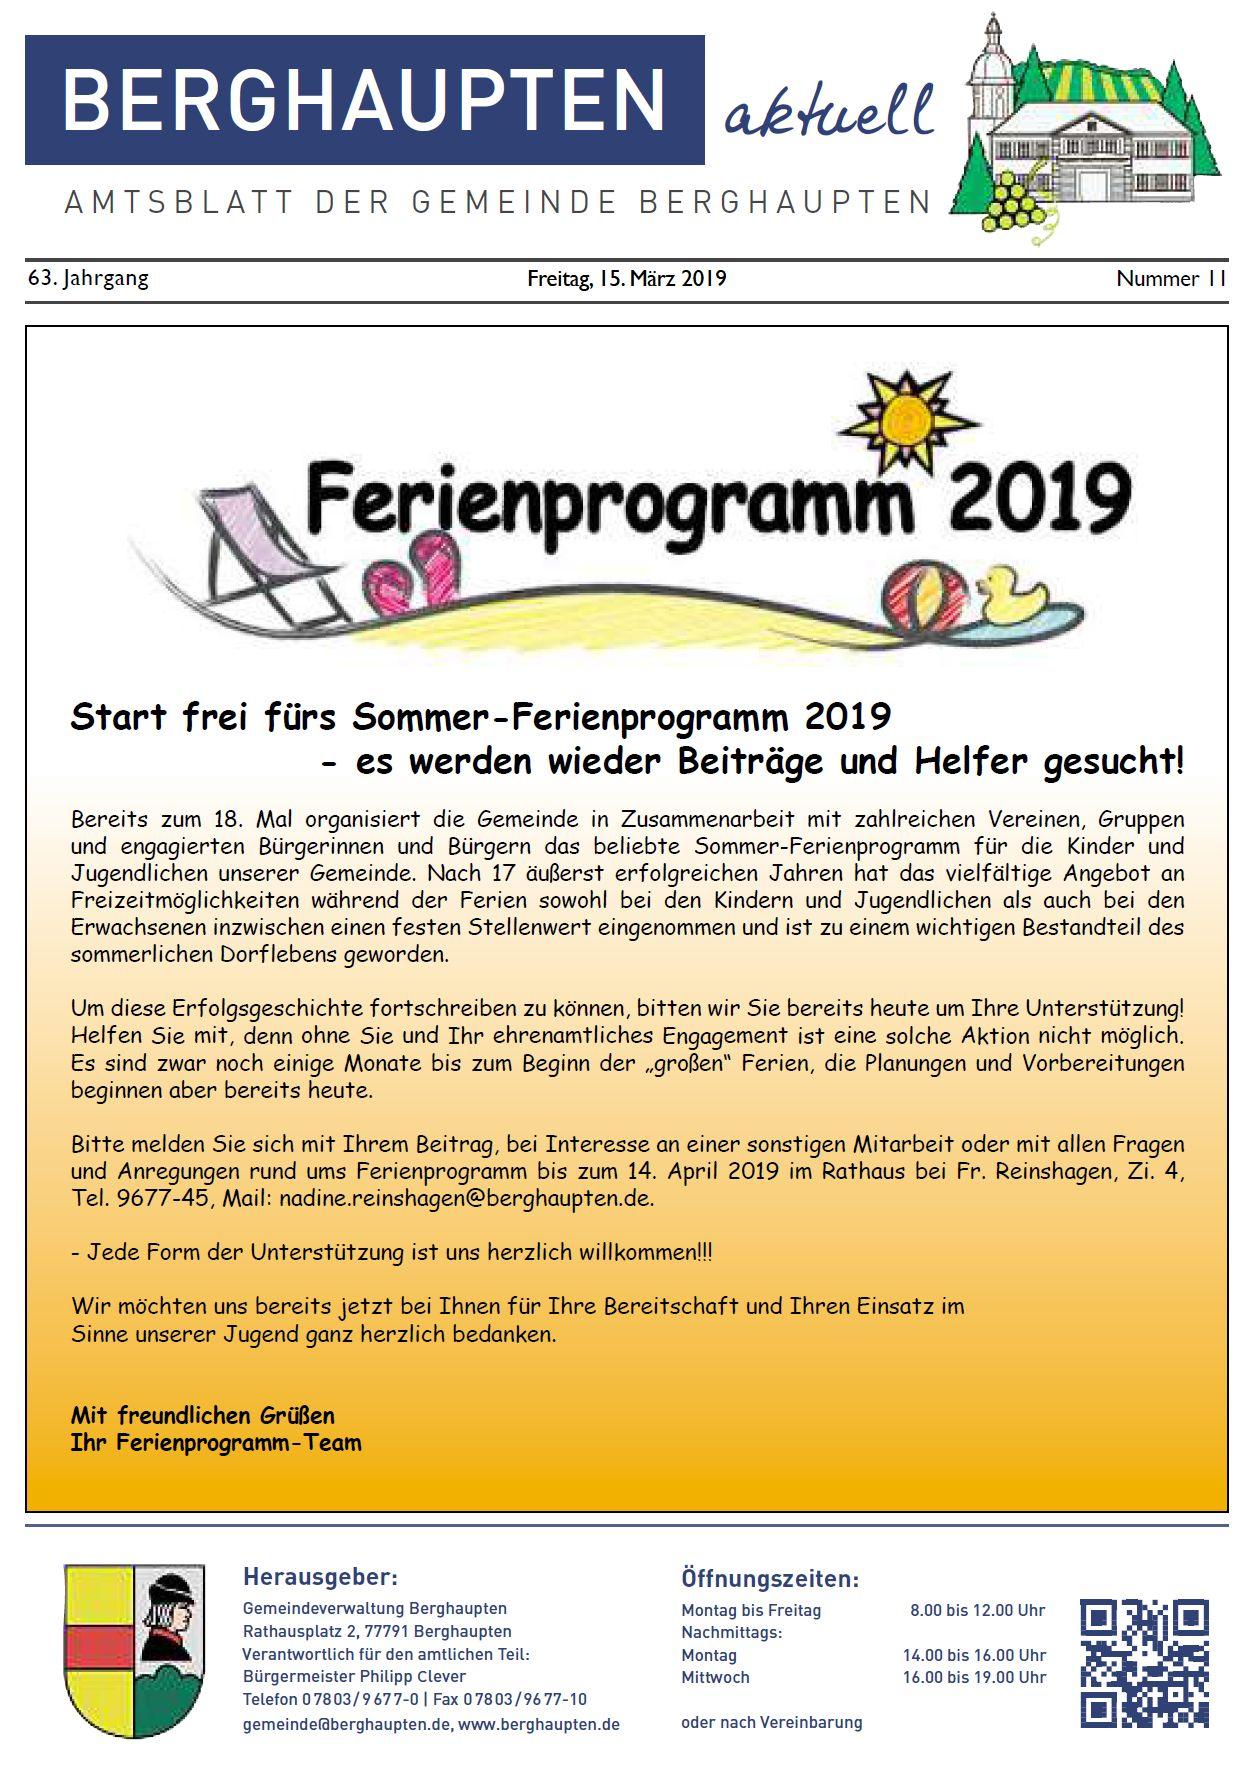 Amtsblatt 2019 KW 11